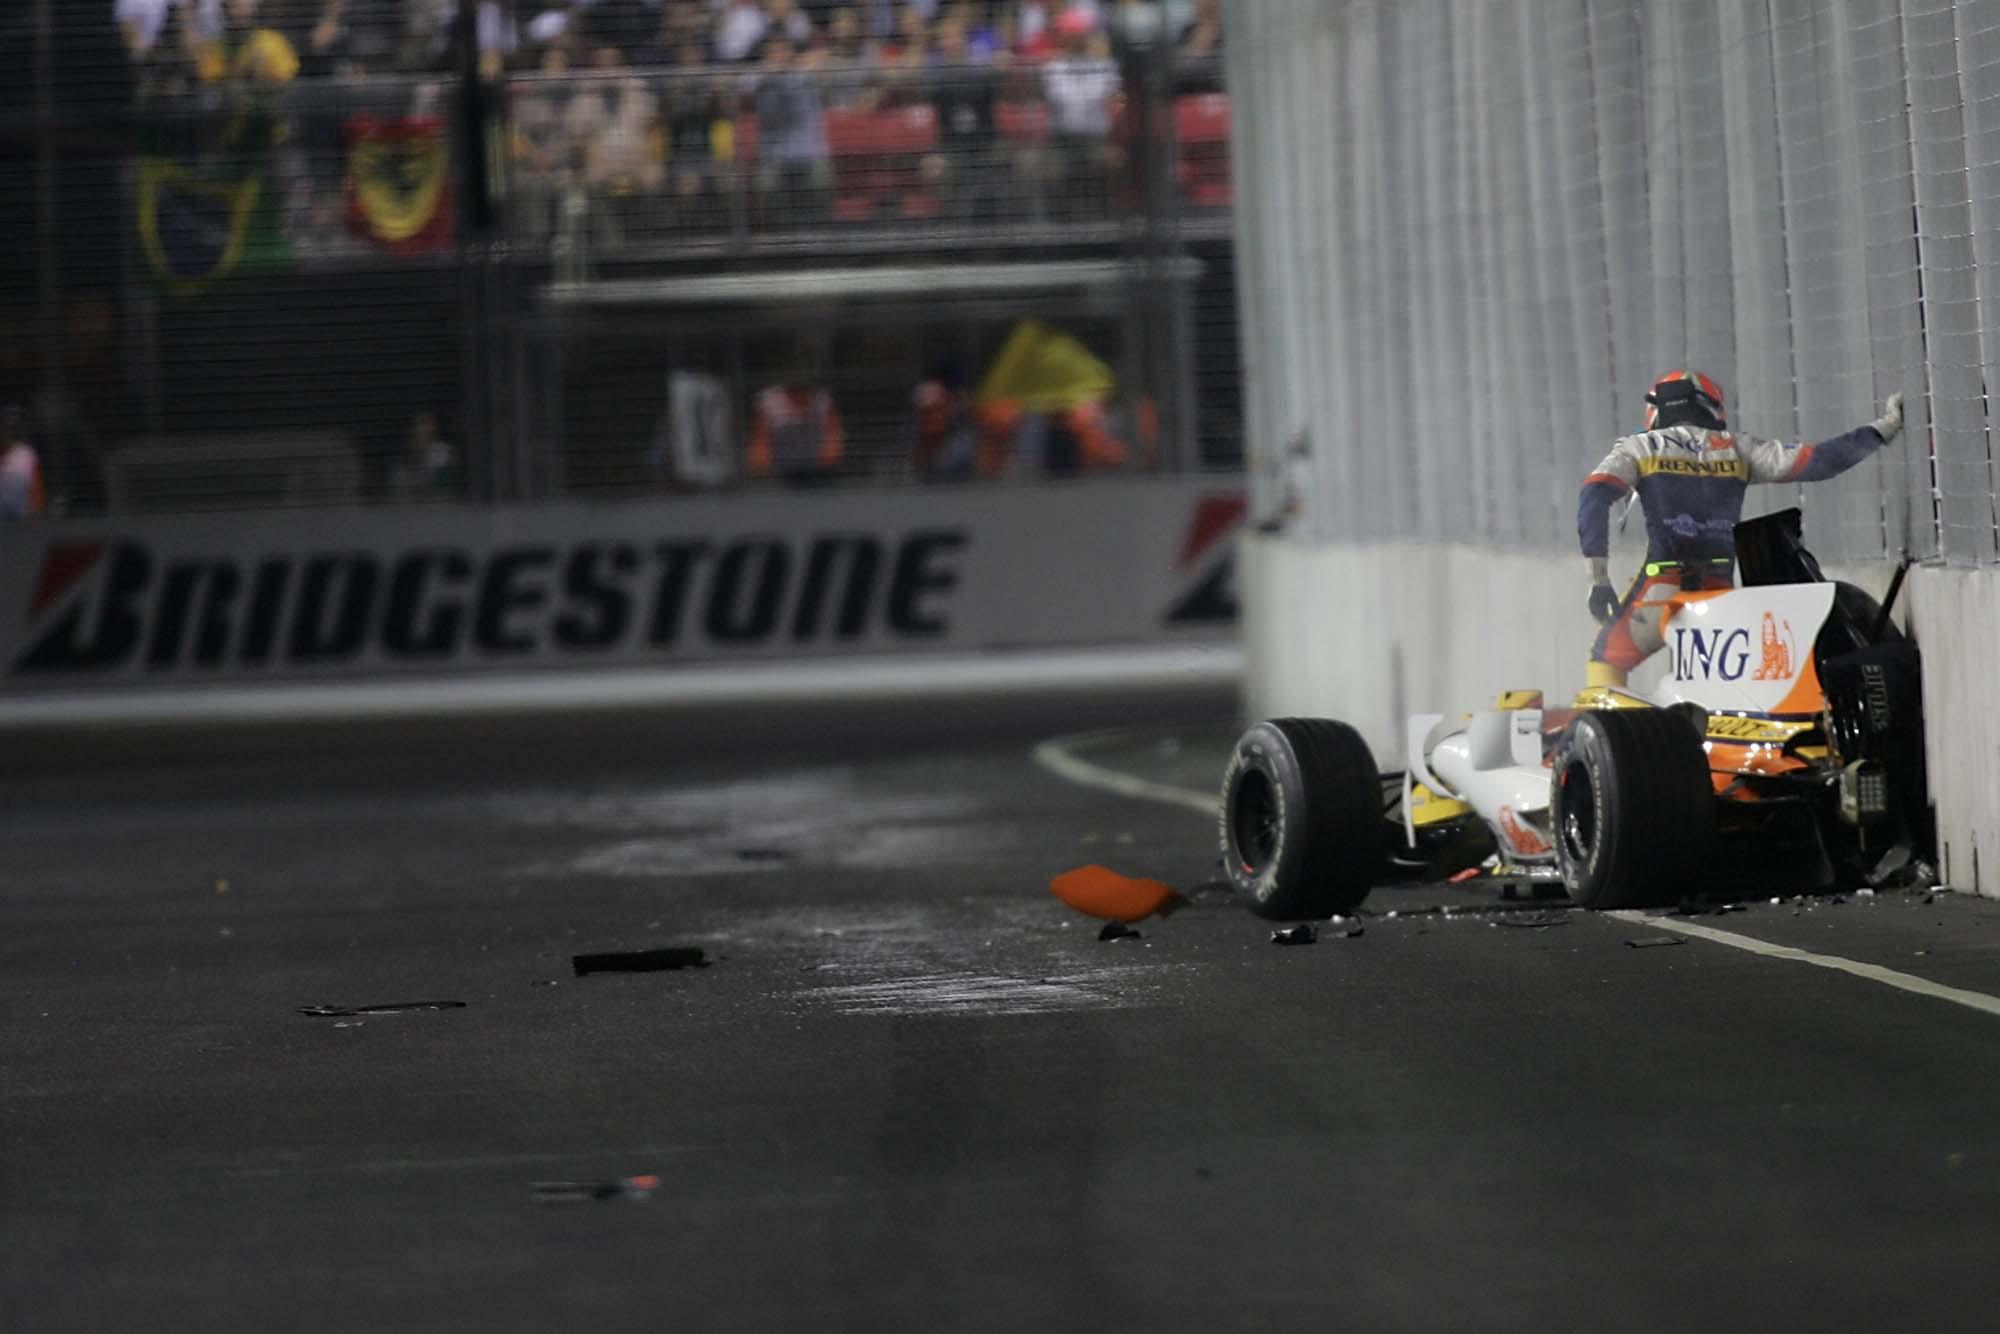 Nelson Piquet crashes his Renault at 2008 Singapore Grand Prix